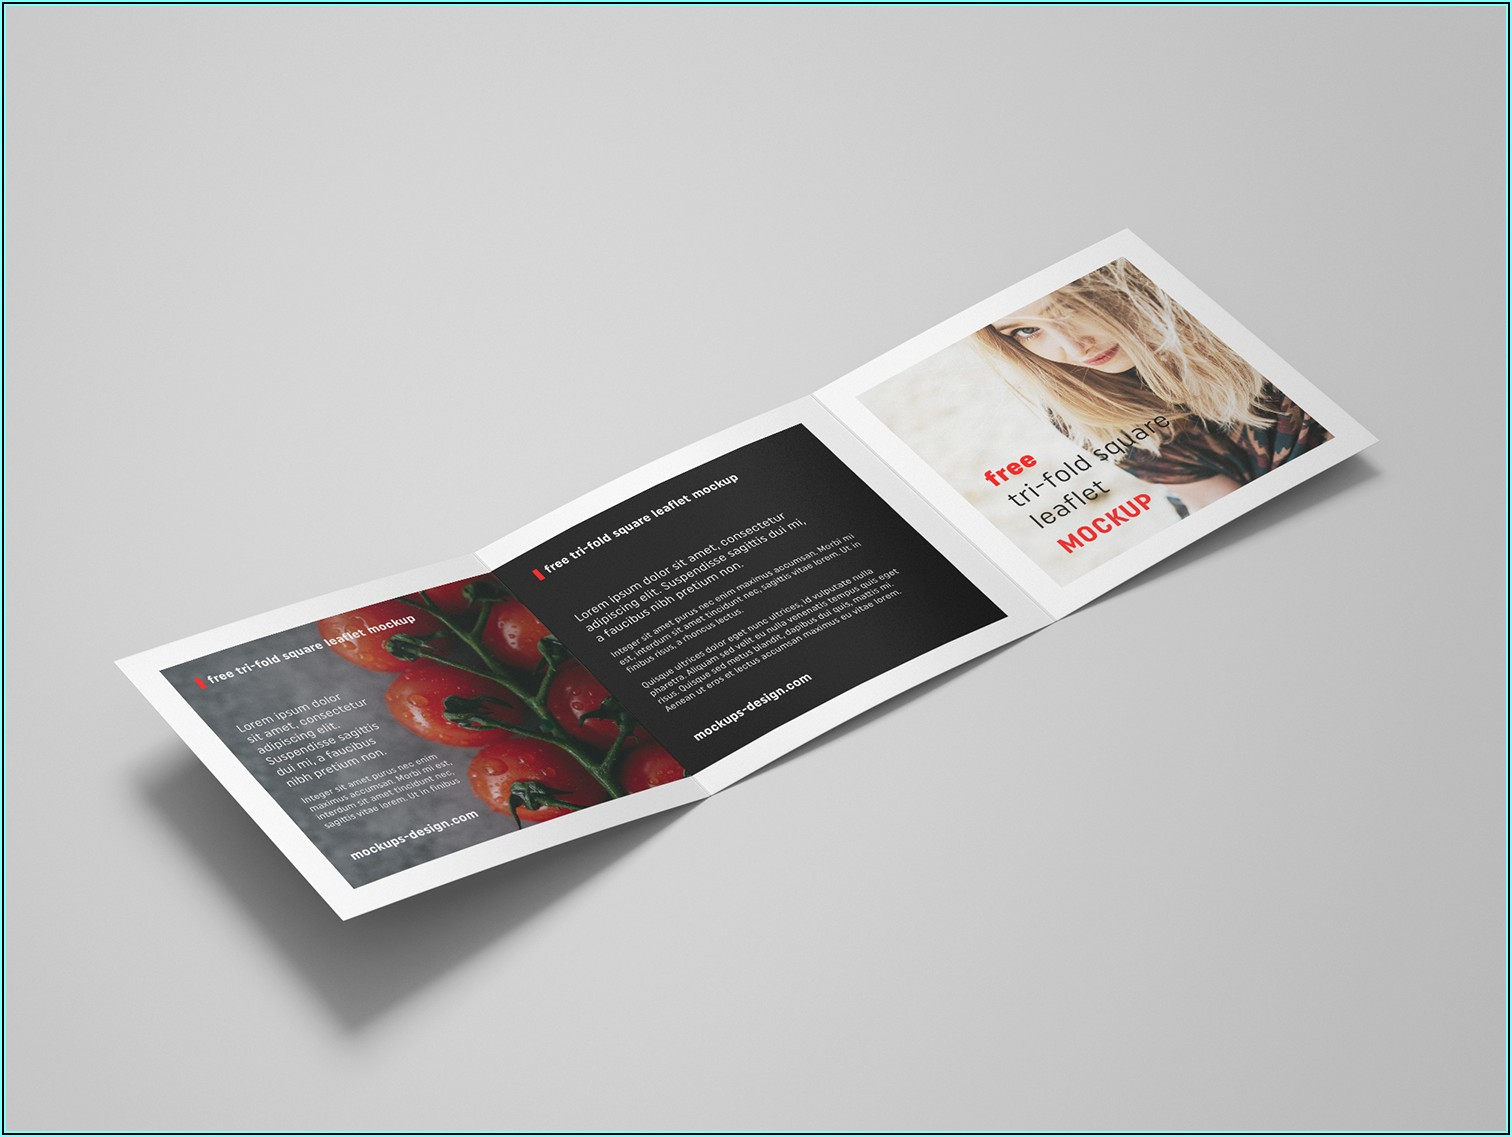 Tri Fold Square Brochure Mockup Free